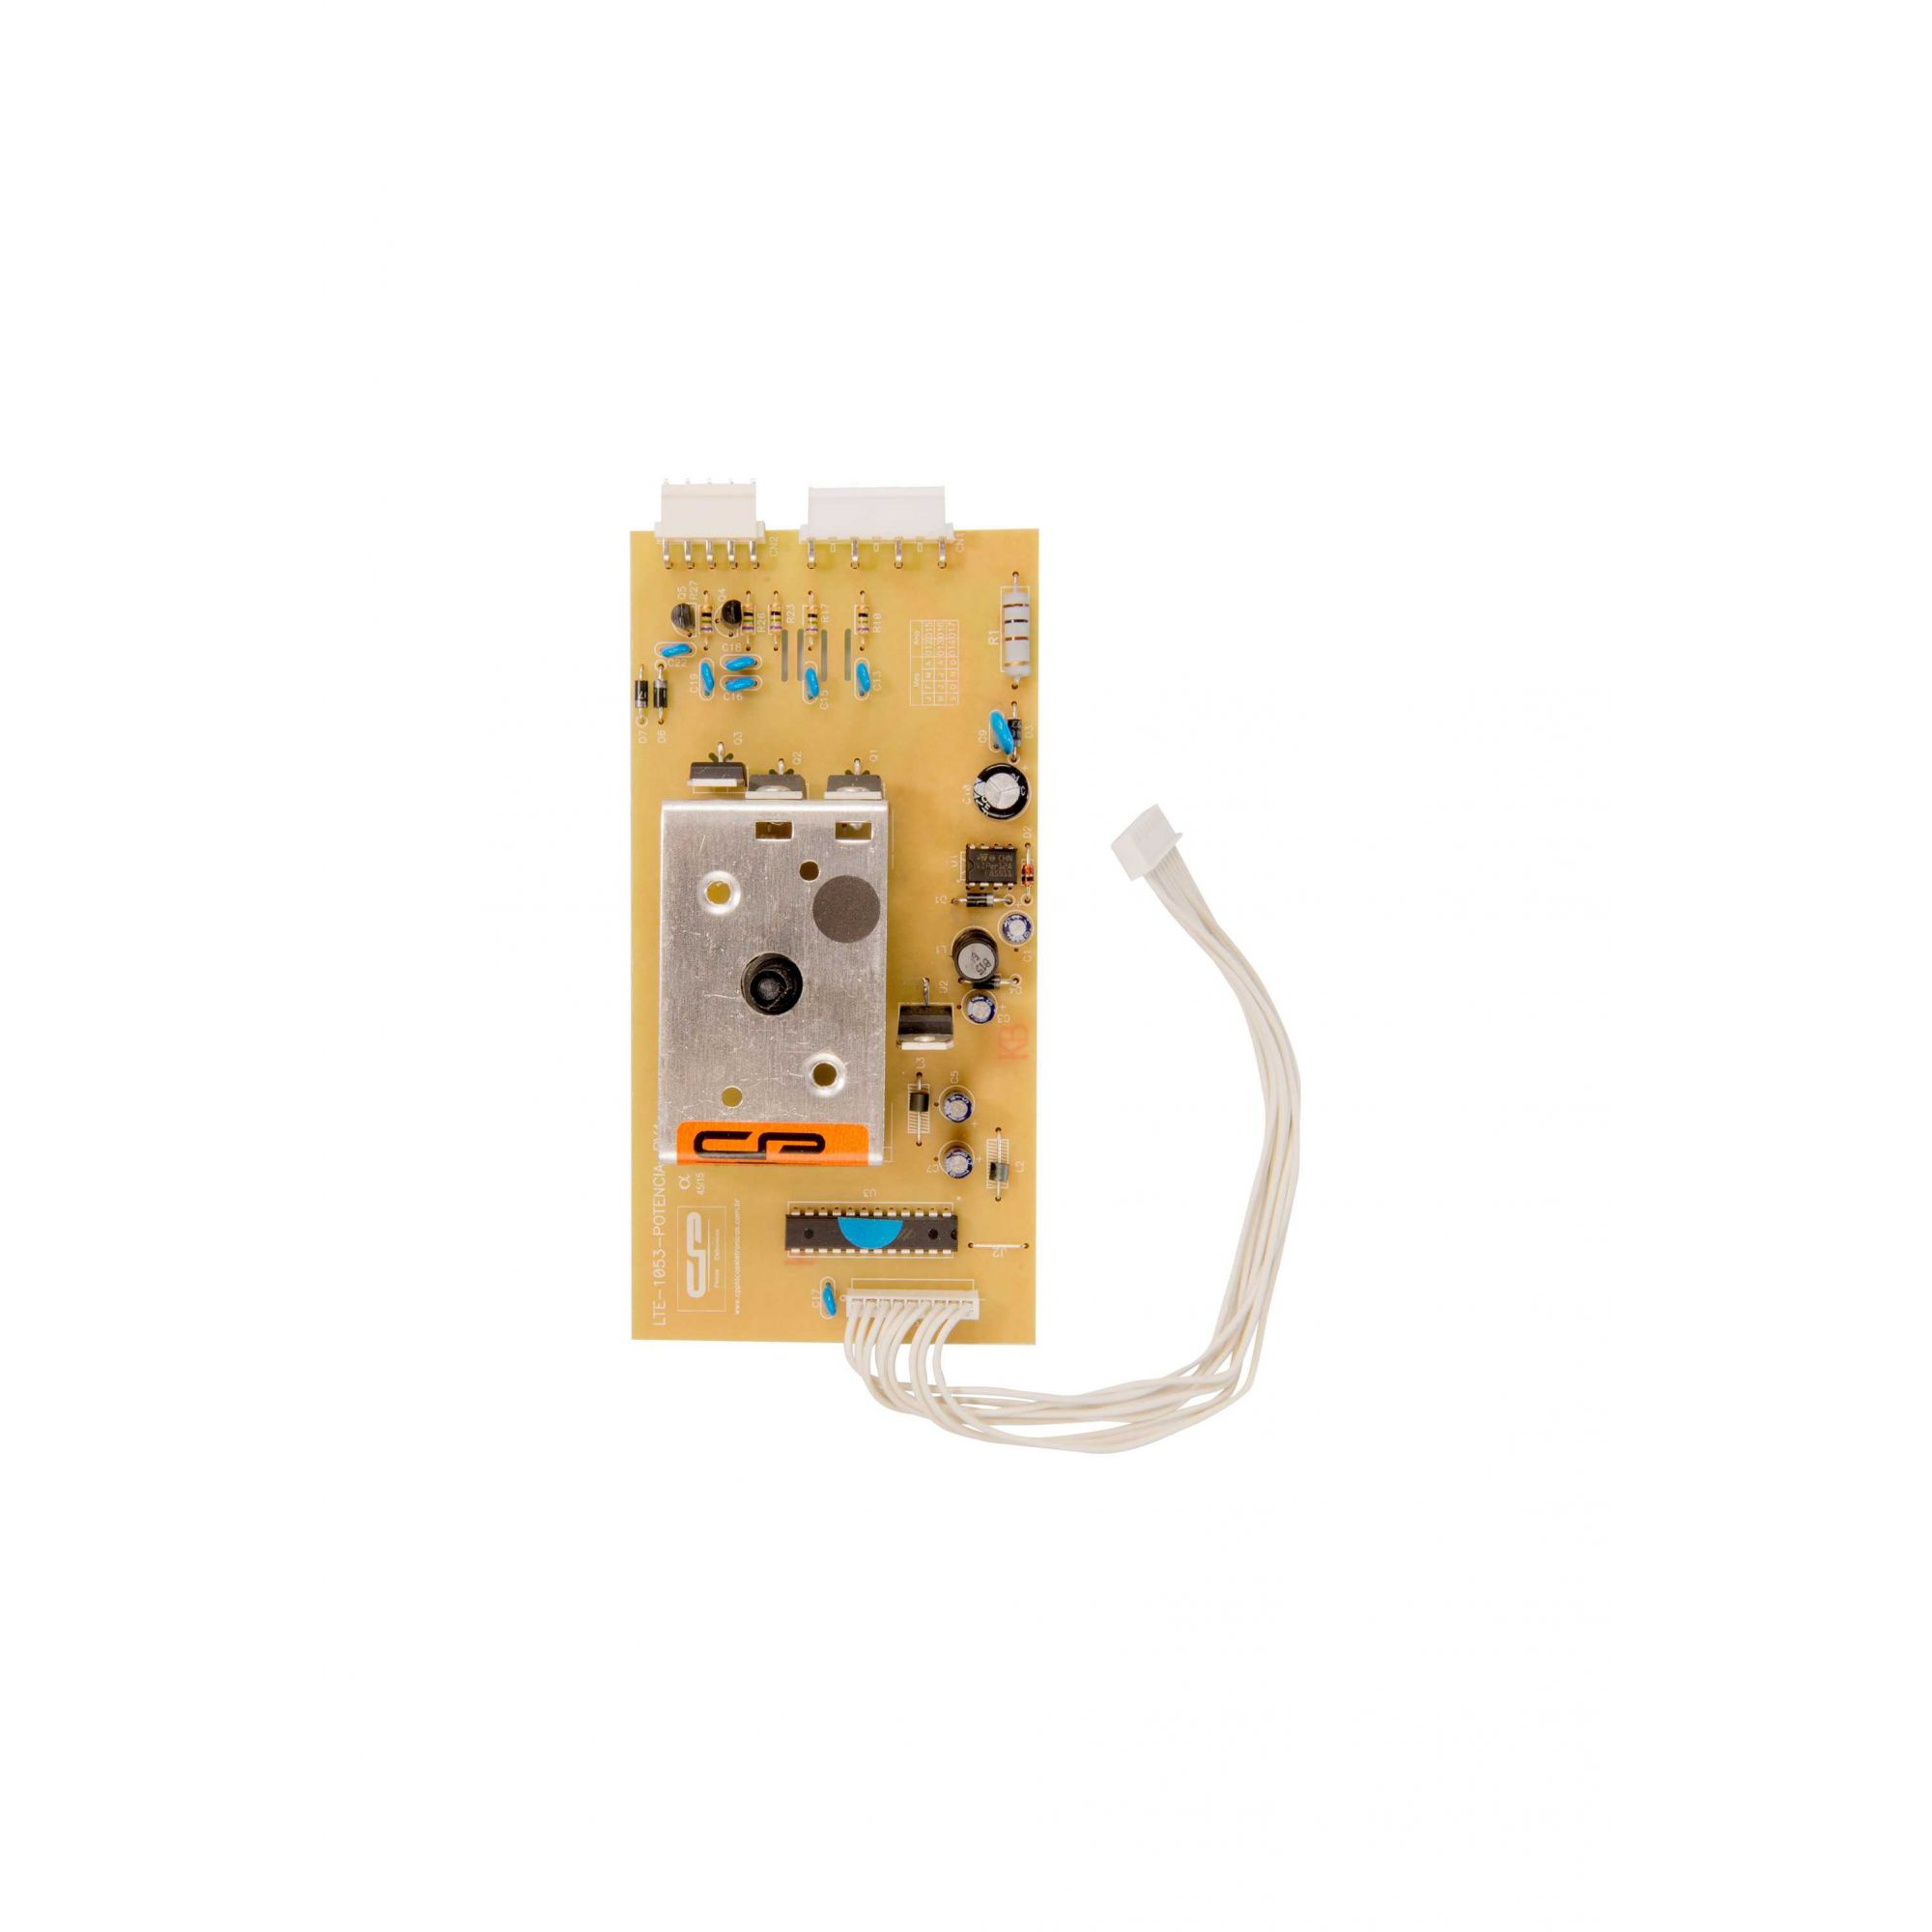 PLACA ELETRONICA LAVADORA ELECTROLUX LTE12 CP1432